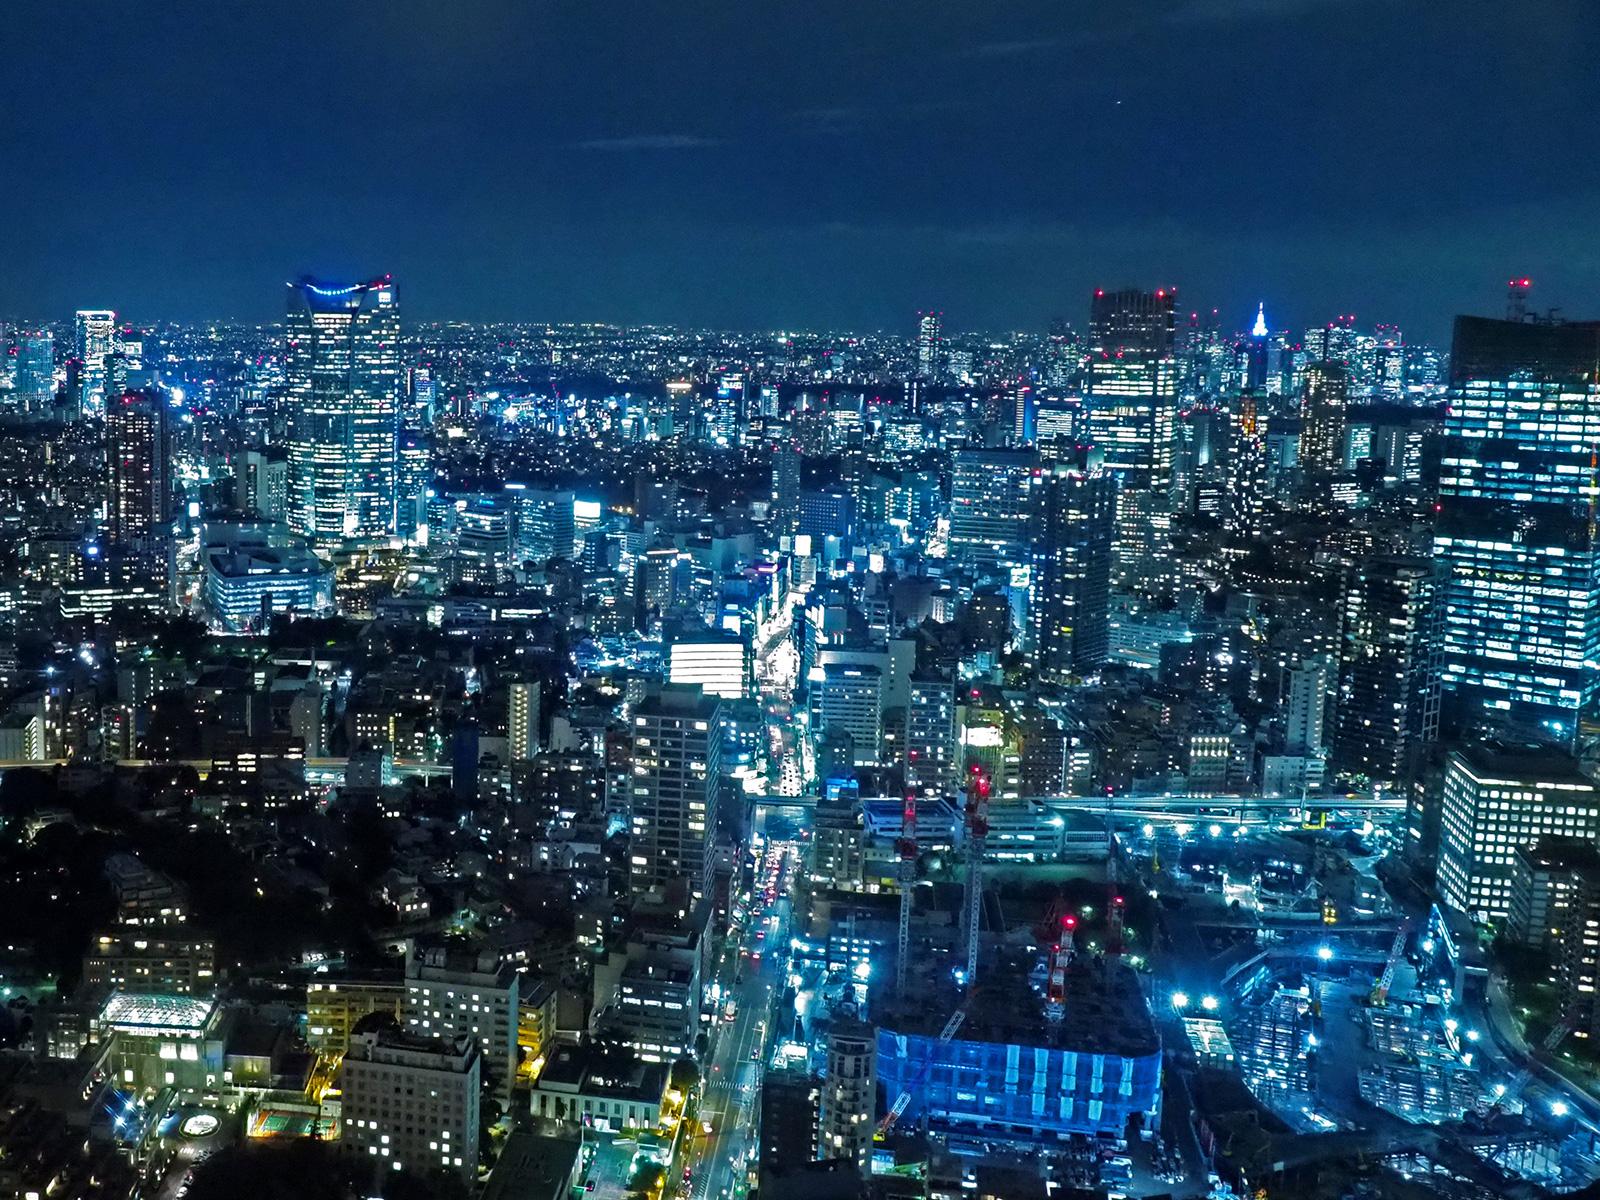 【OLYMPUS】夜の街を撮り歩き